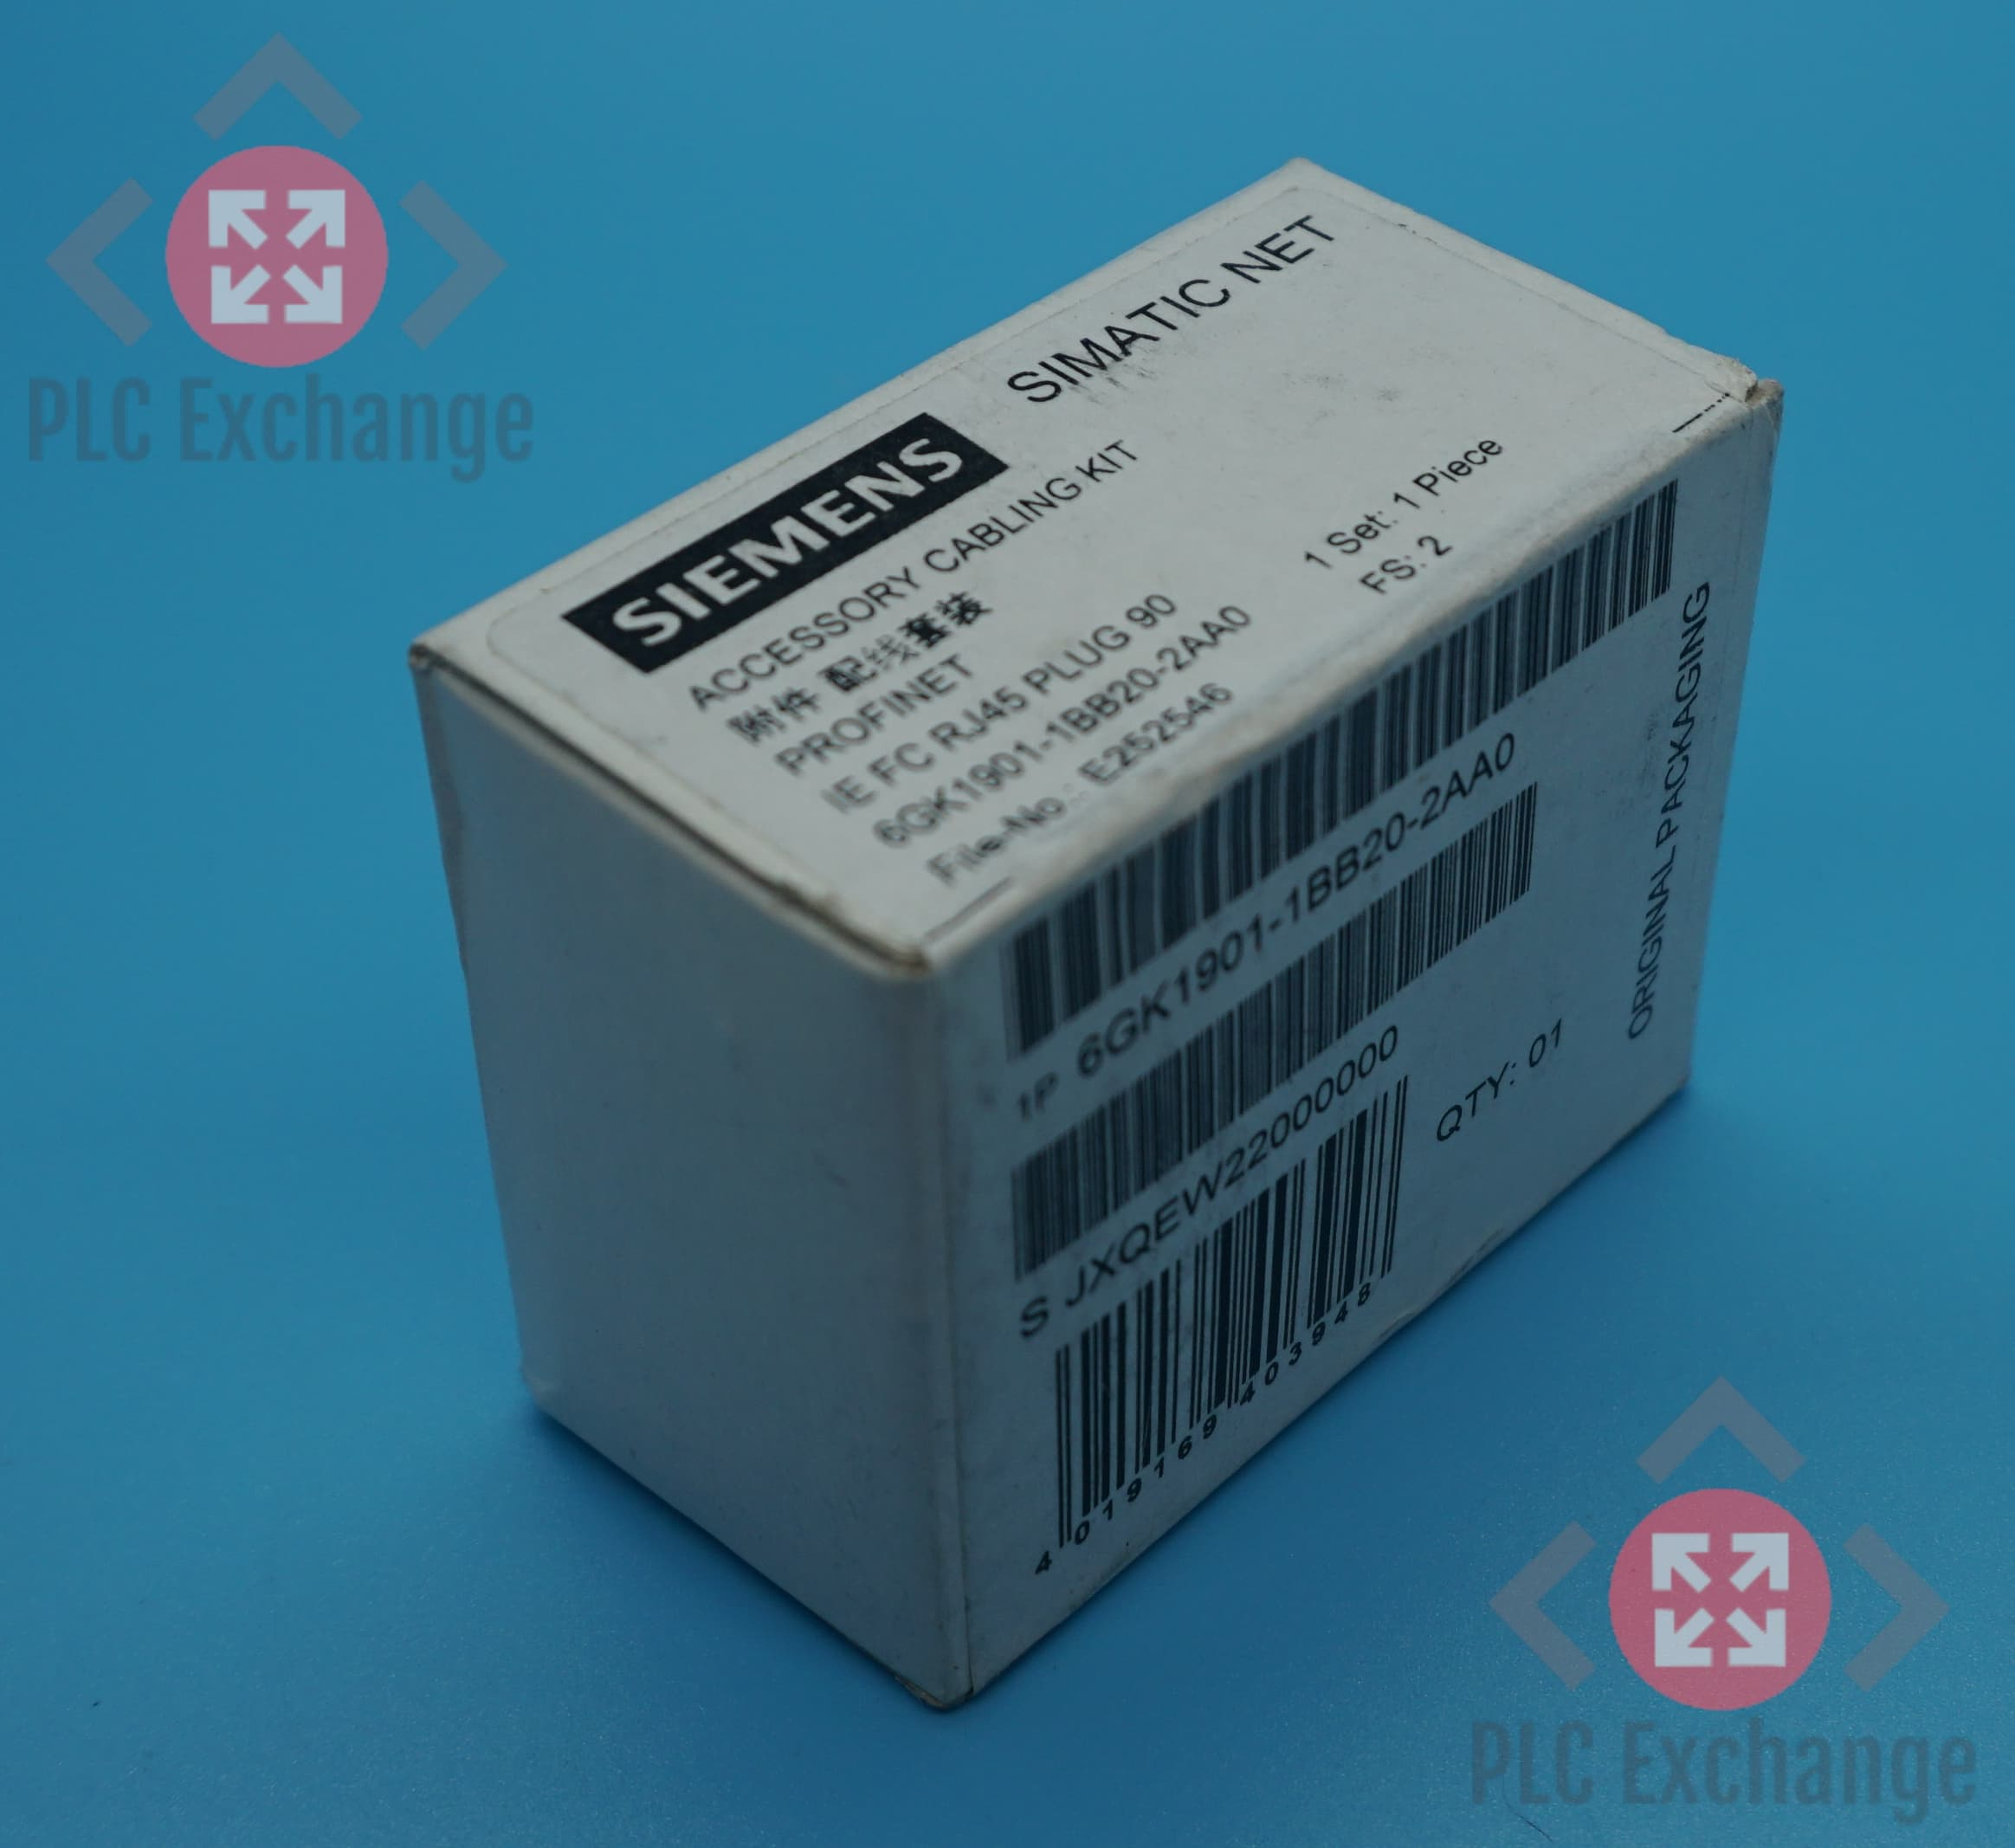 New Lot of 5 Siemens Simatic Net 6GK1901-1BB20-2AA0 Industrial Ethernet Plugs